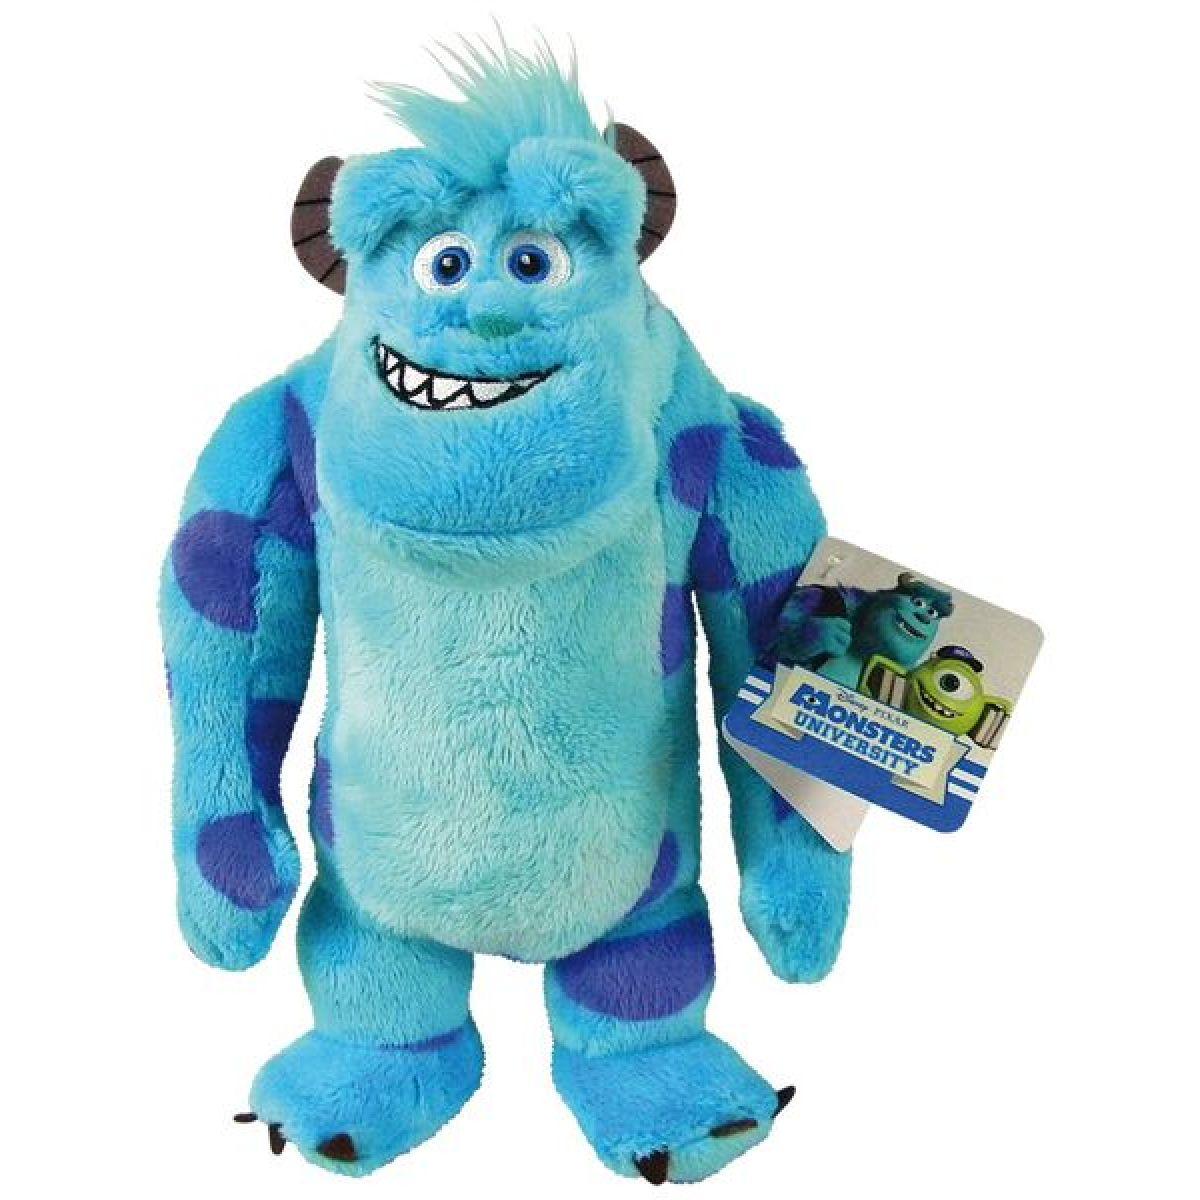 Monsters University plyš 25 cm Sulley